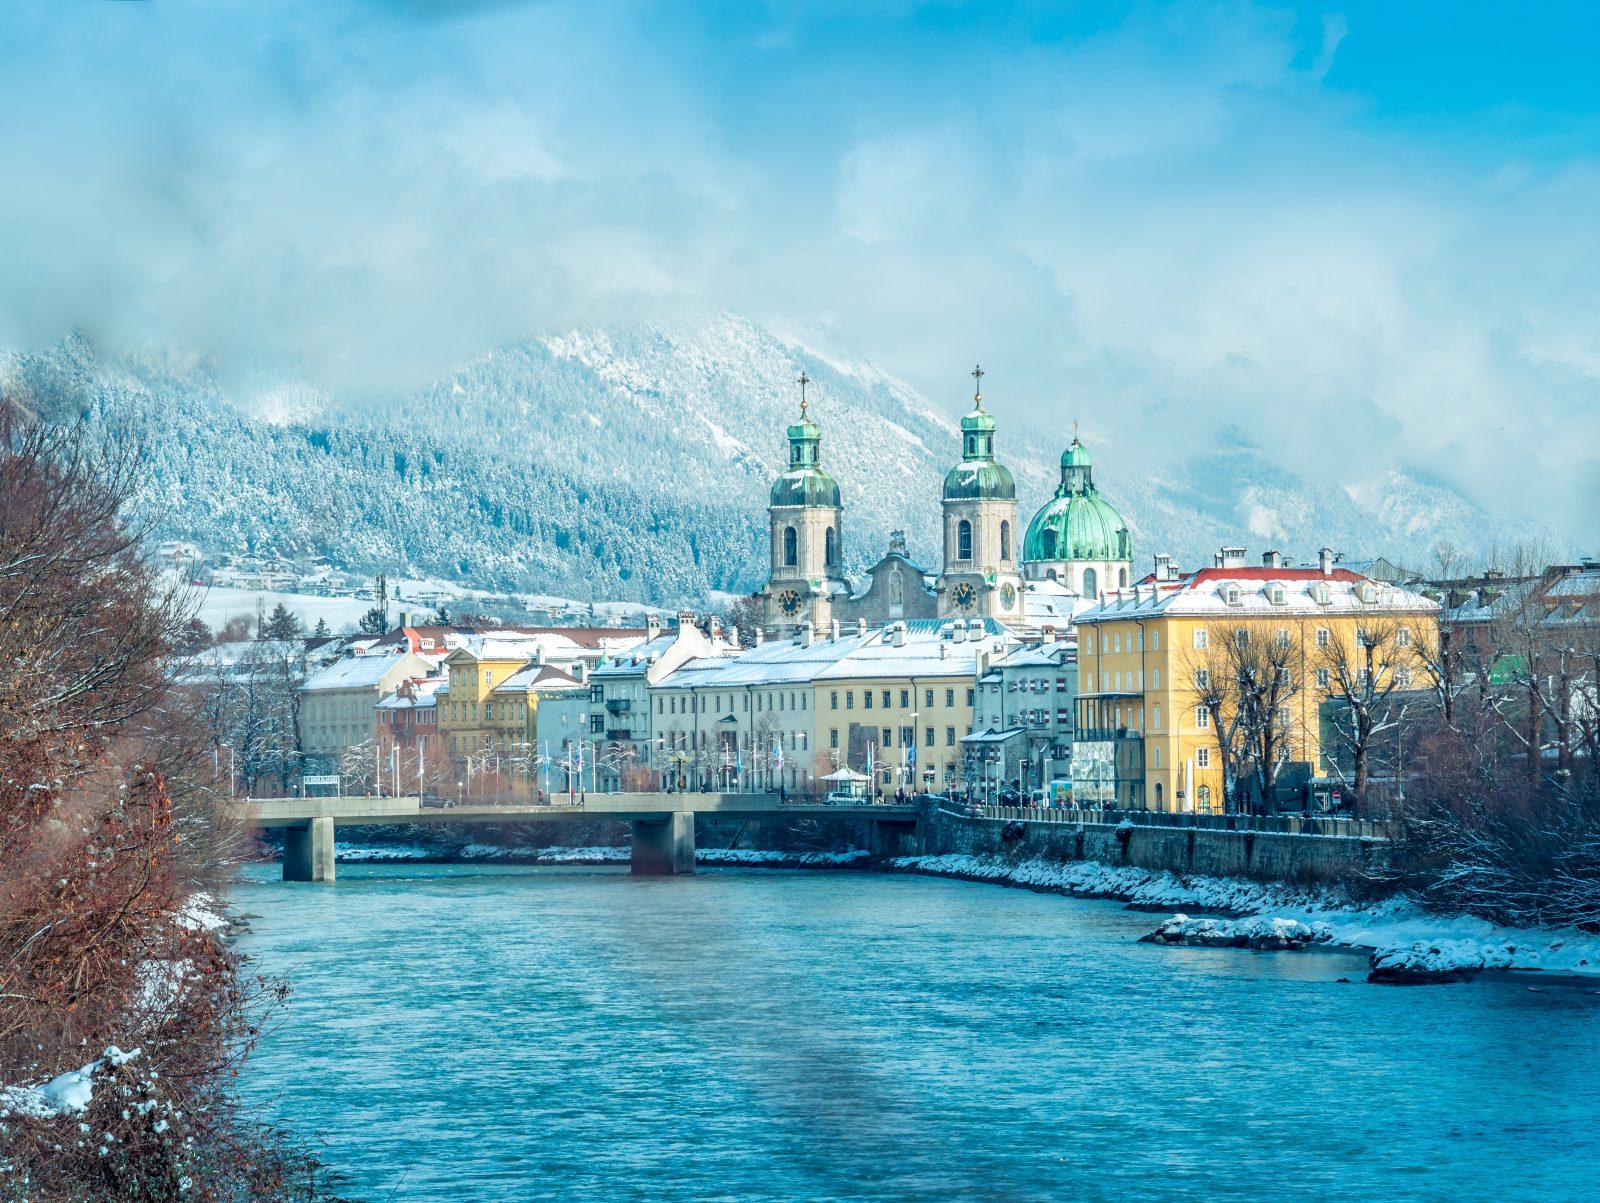 Reasons to Visit Innsbruck